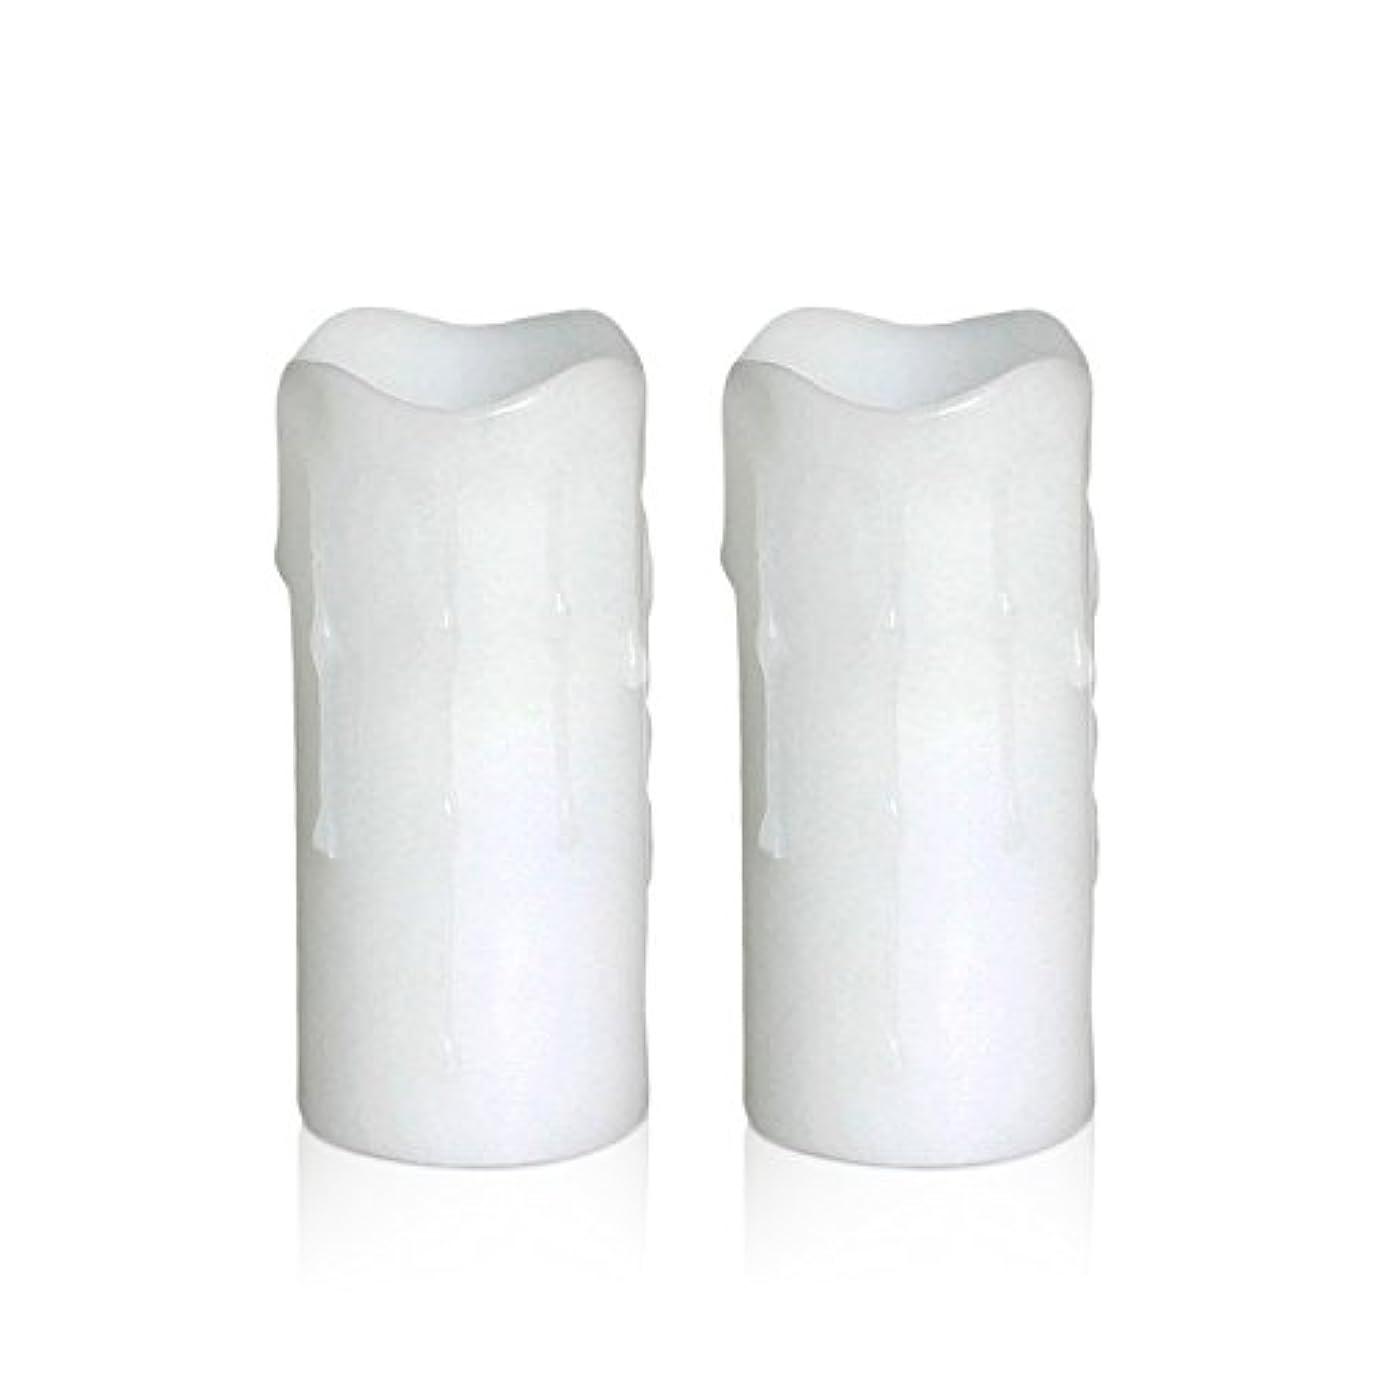 極小疾患現代の電池式(2aa) Dripping Flameless LED Votive Candles (Pack of 2 ) 1.75 * 4